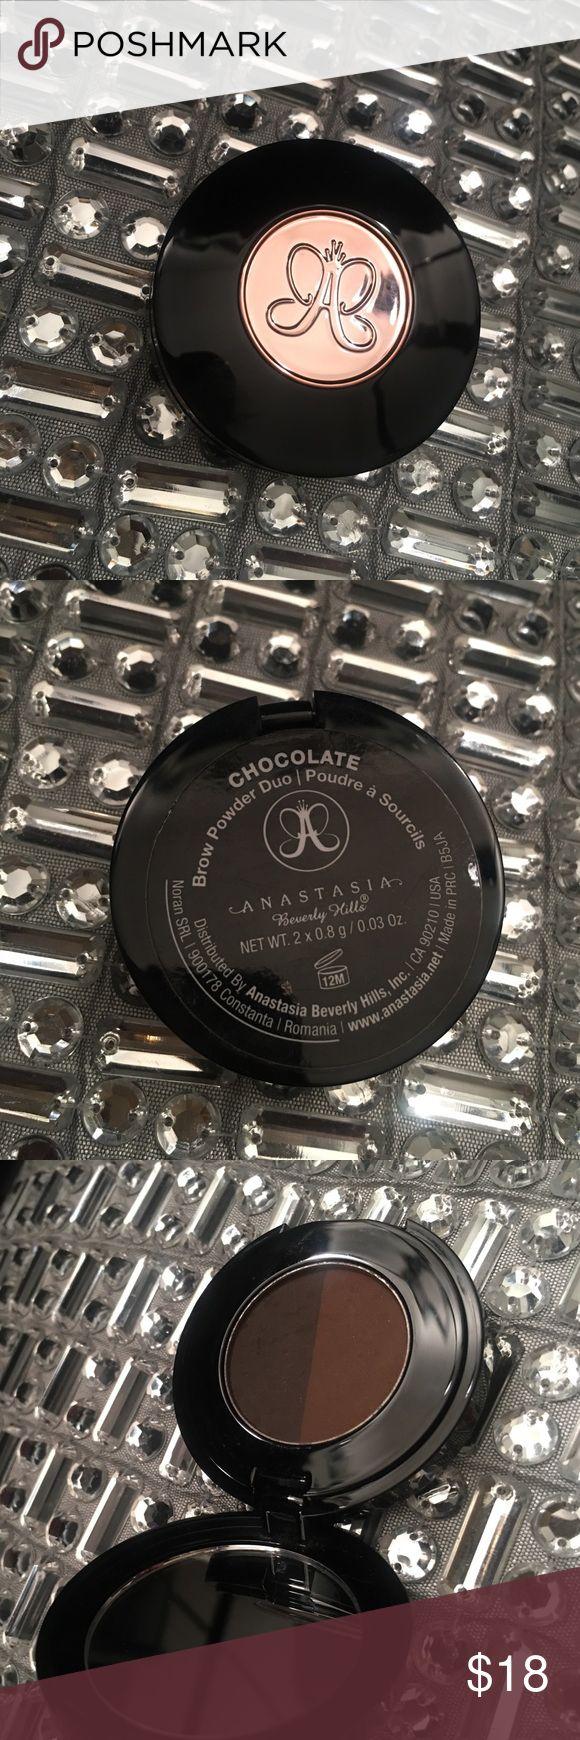 Anastasia Brow Powder in Chocolate Brow Powder Duo in Chocolate Anastasia Beverly Hills Makeup Eyebrow Filler